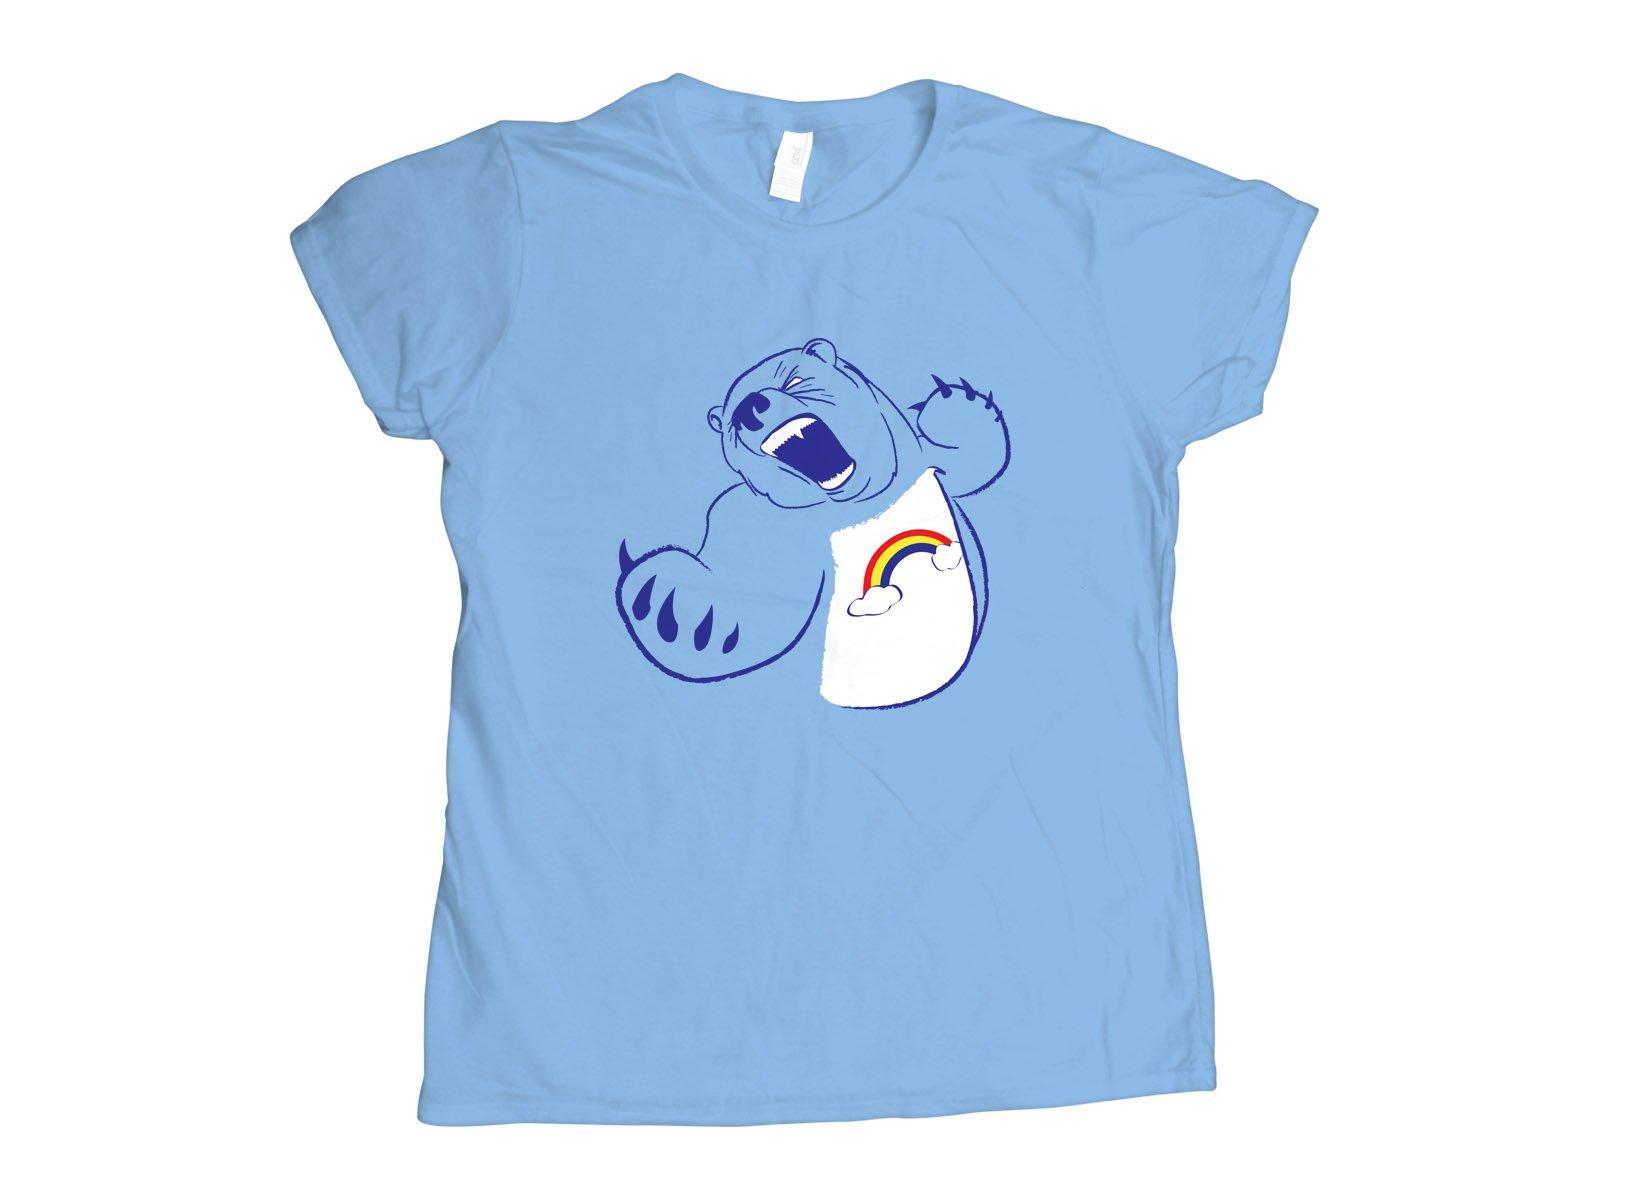 Scarebear on Womens T-Shirt